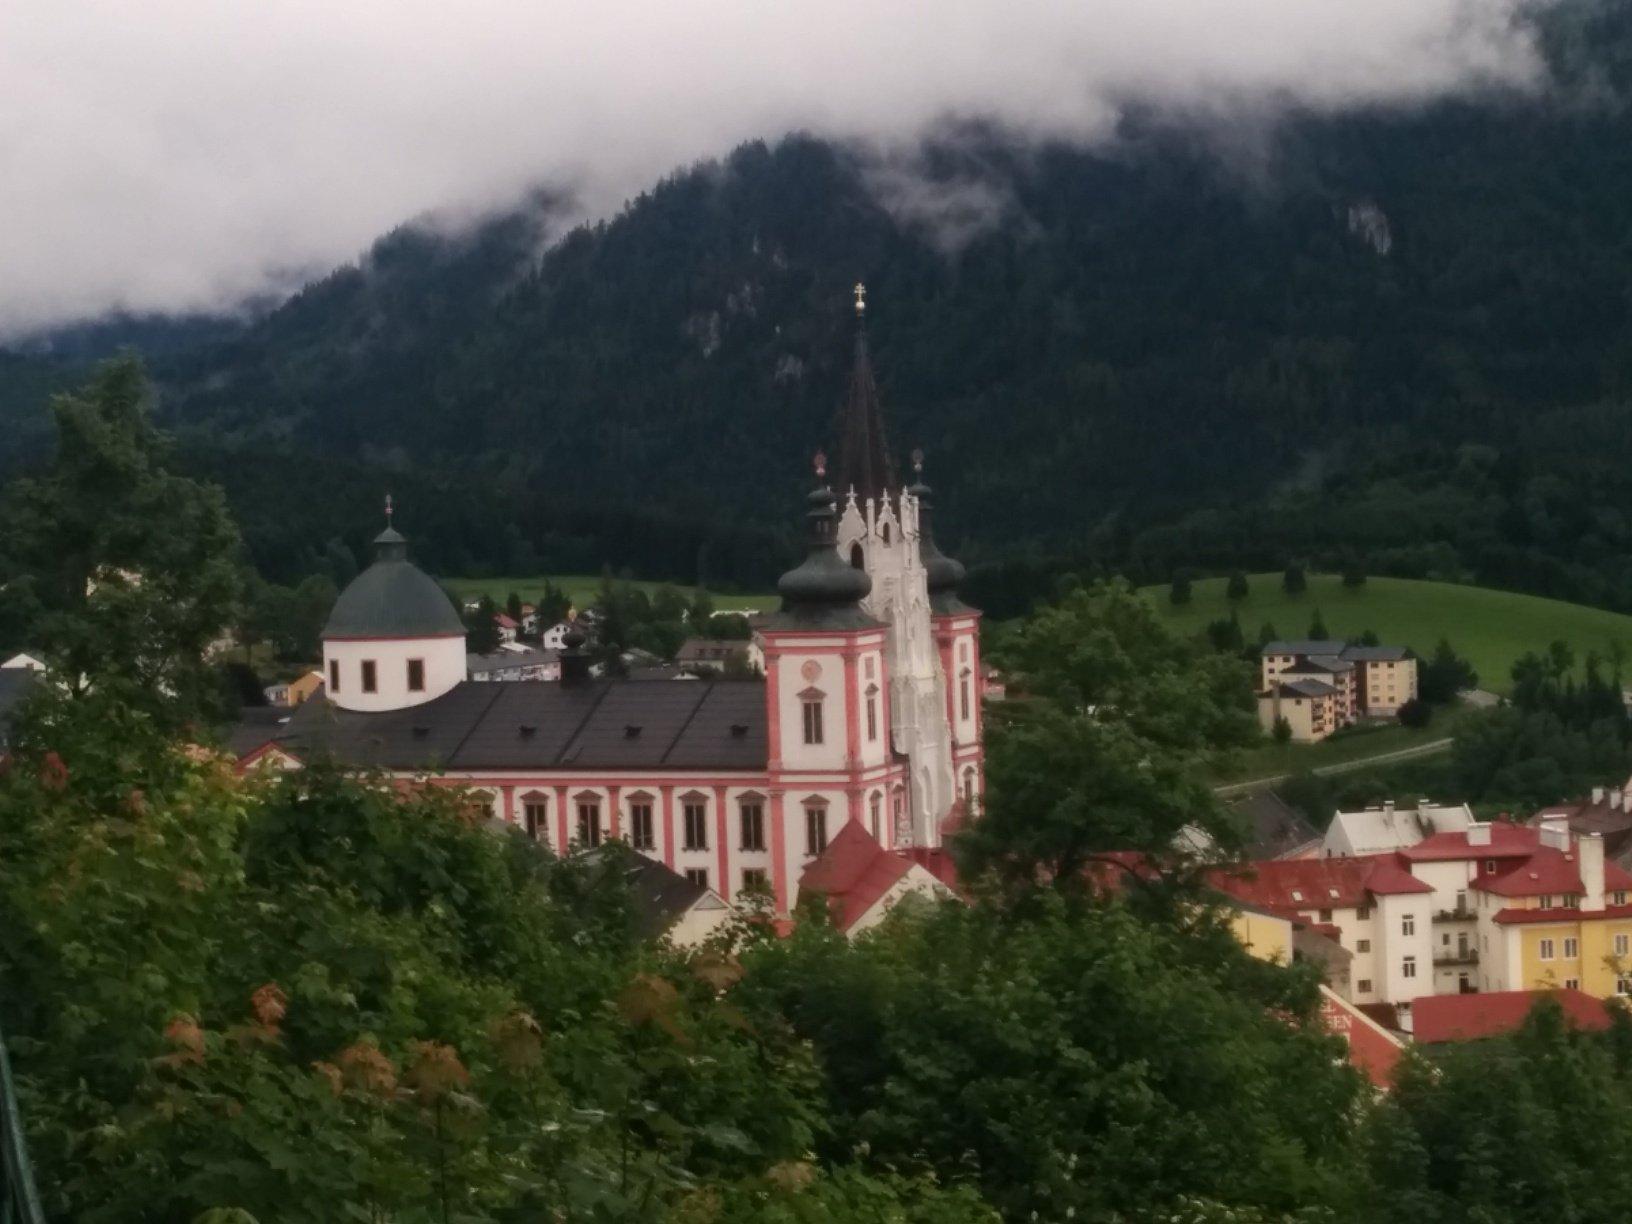 Basilika in Mariazell - Ziel der Via Sacra